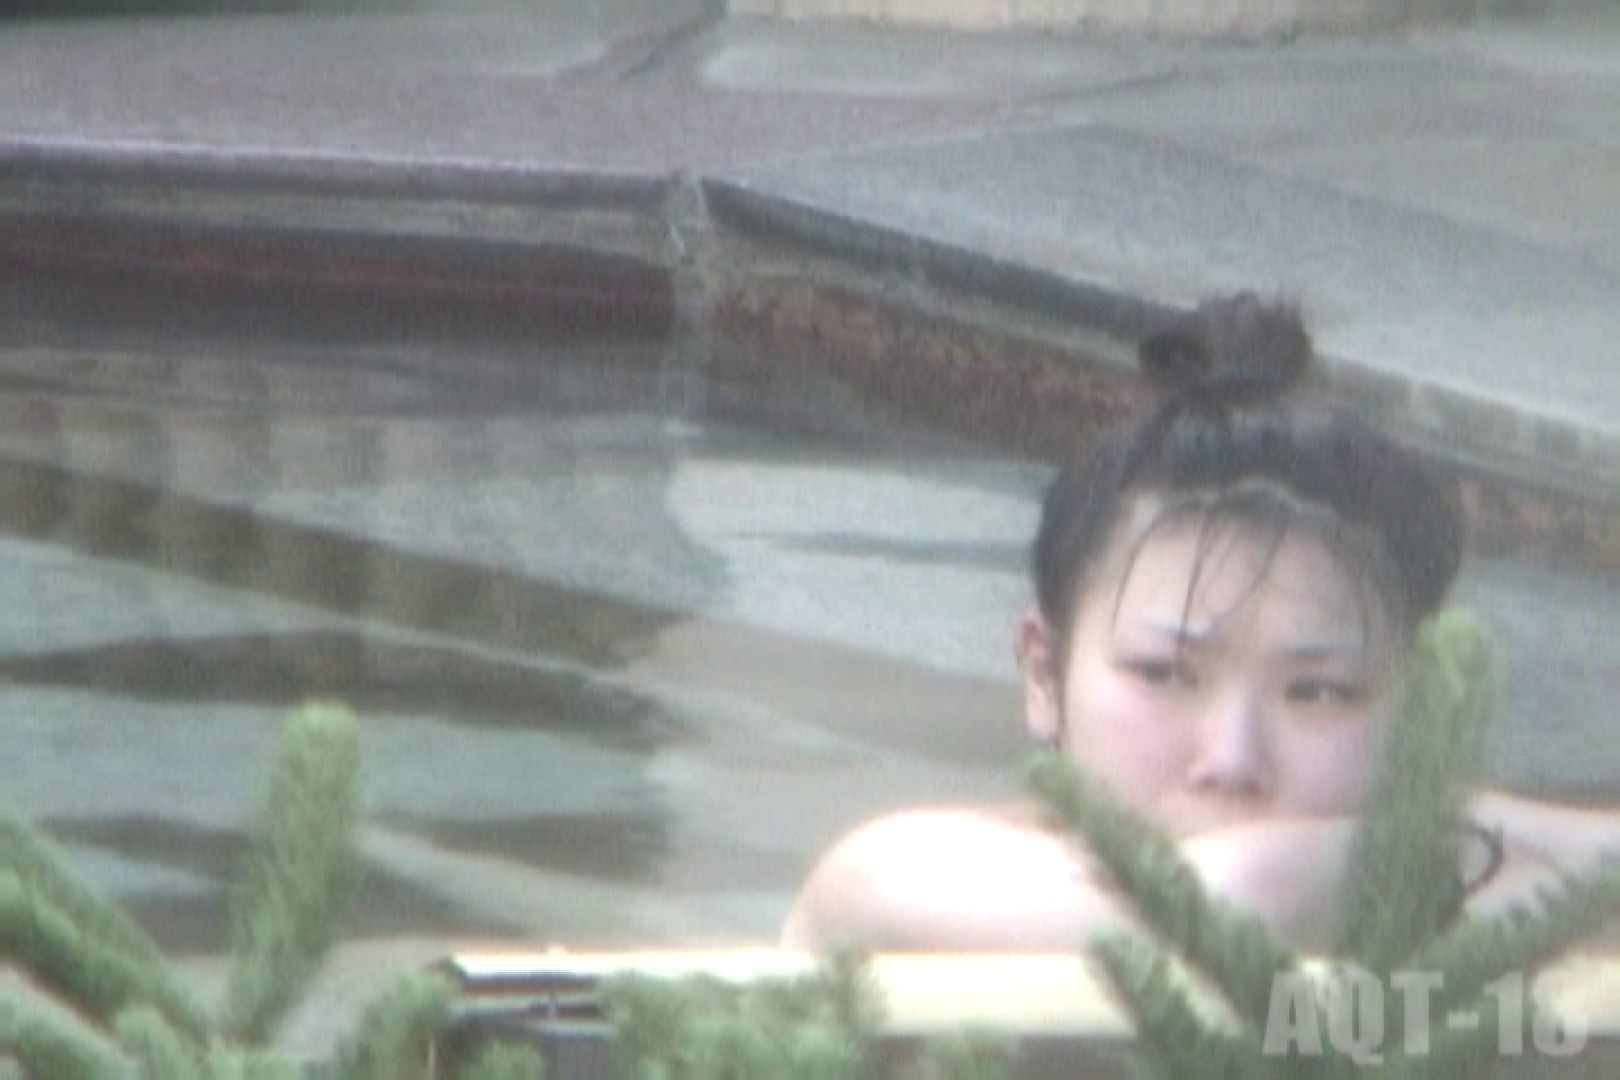 Aquaな露天風呂Vol.855 露天 | OLセックス  67画像 64